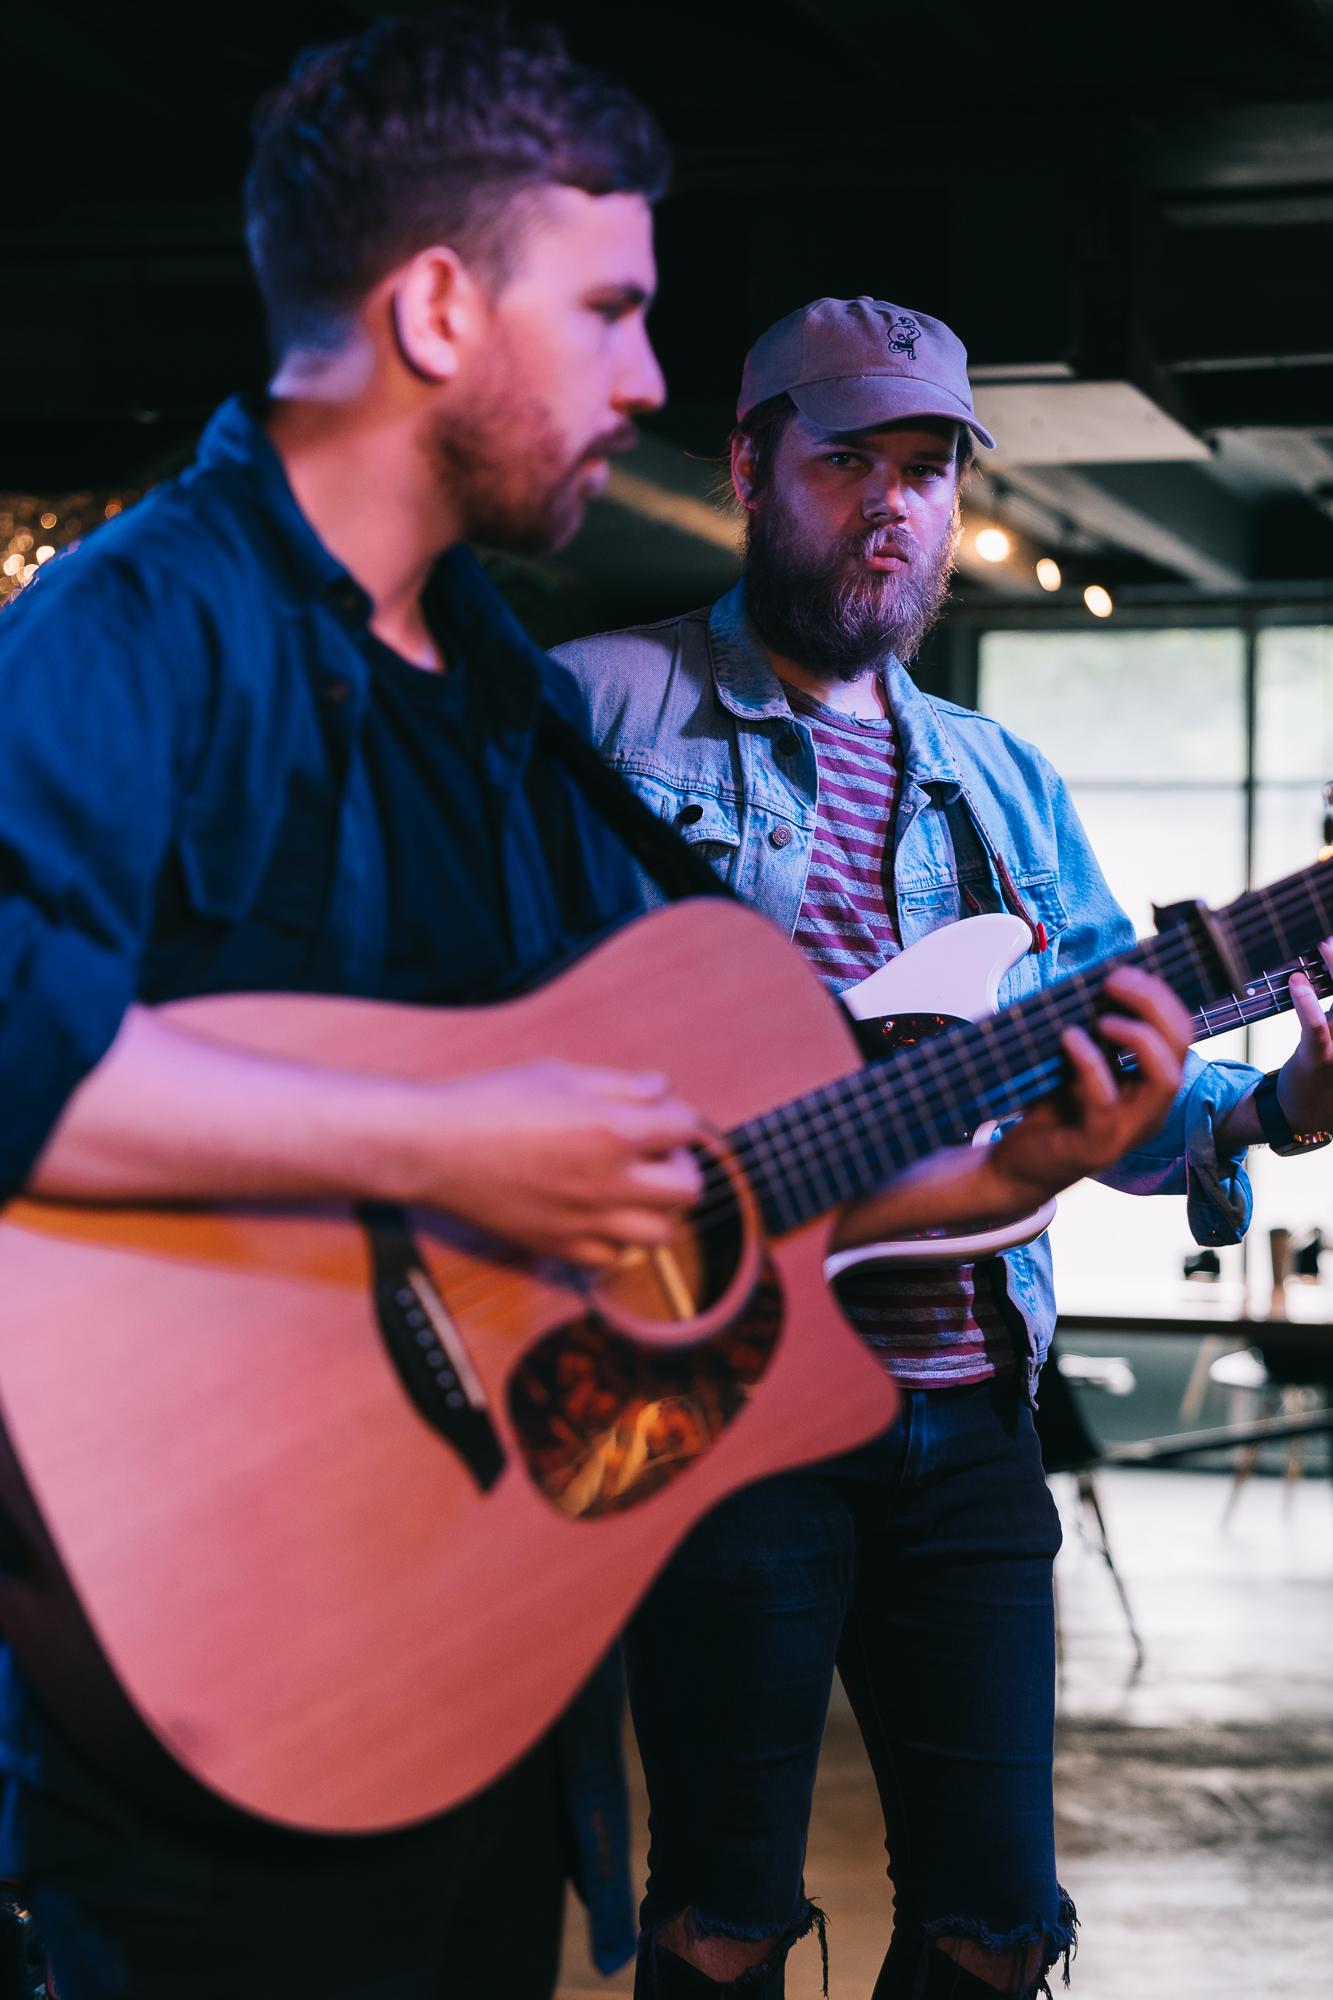 Bridges-band-live-session-20170101-0139-Hanny-Foxhall.jpg